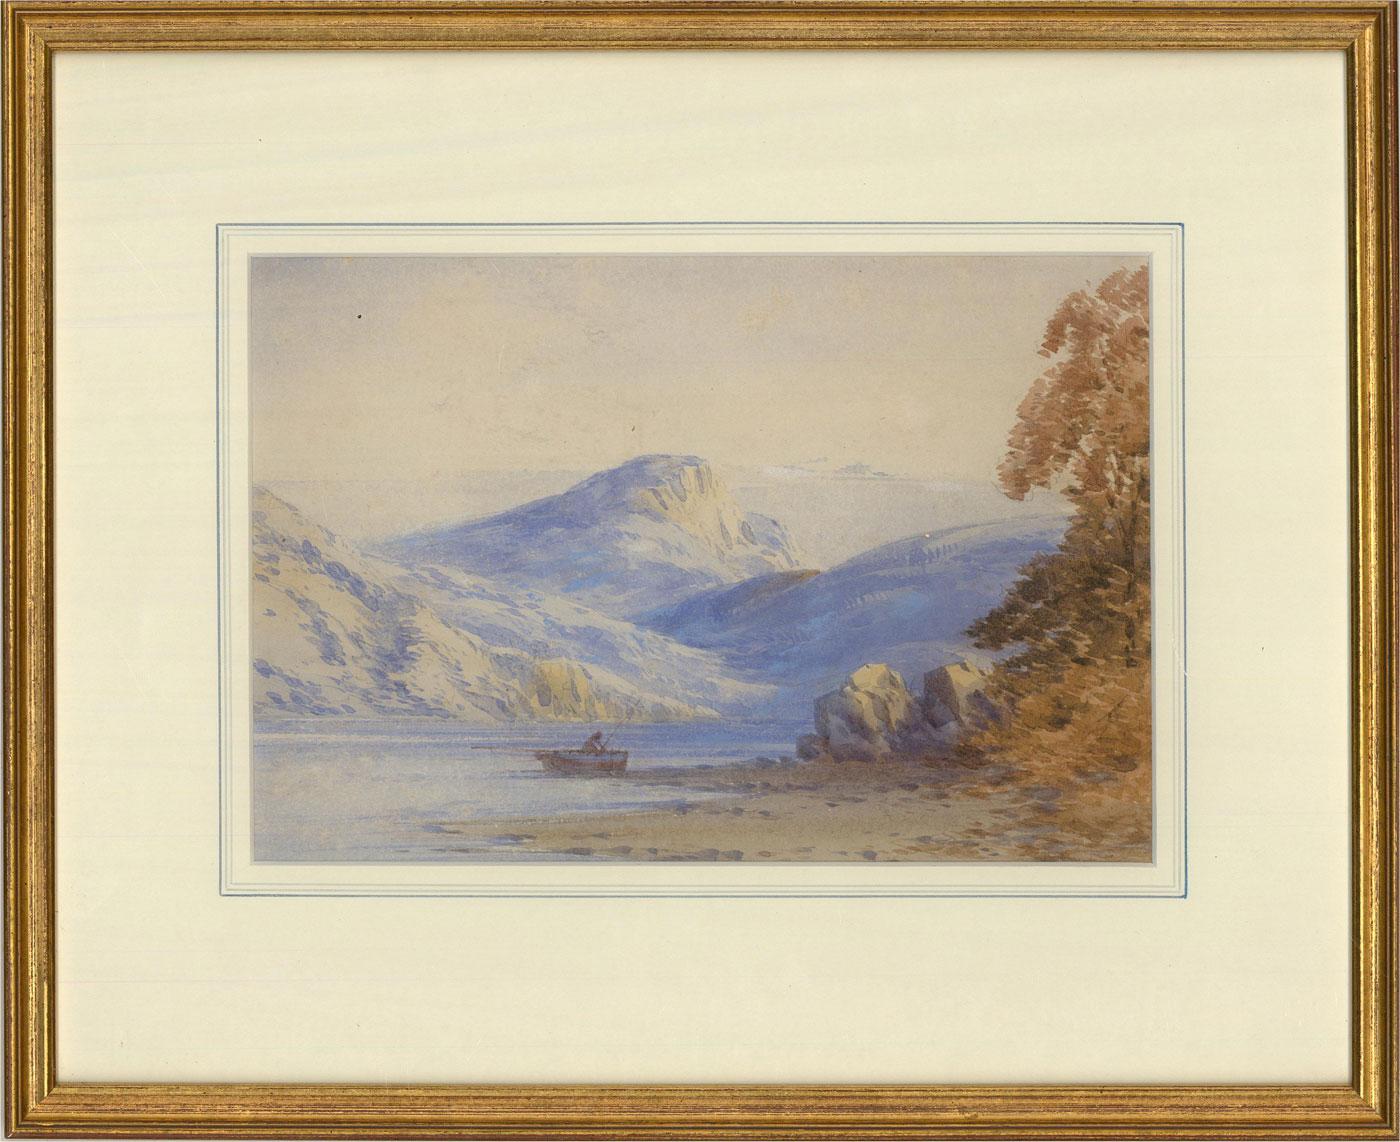 Attrib. Thomas Creswick RA (1811-1869) - Watercolour, The Fisherman